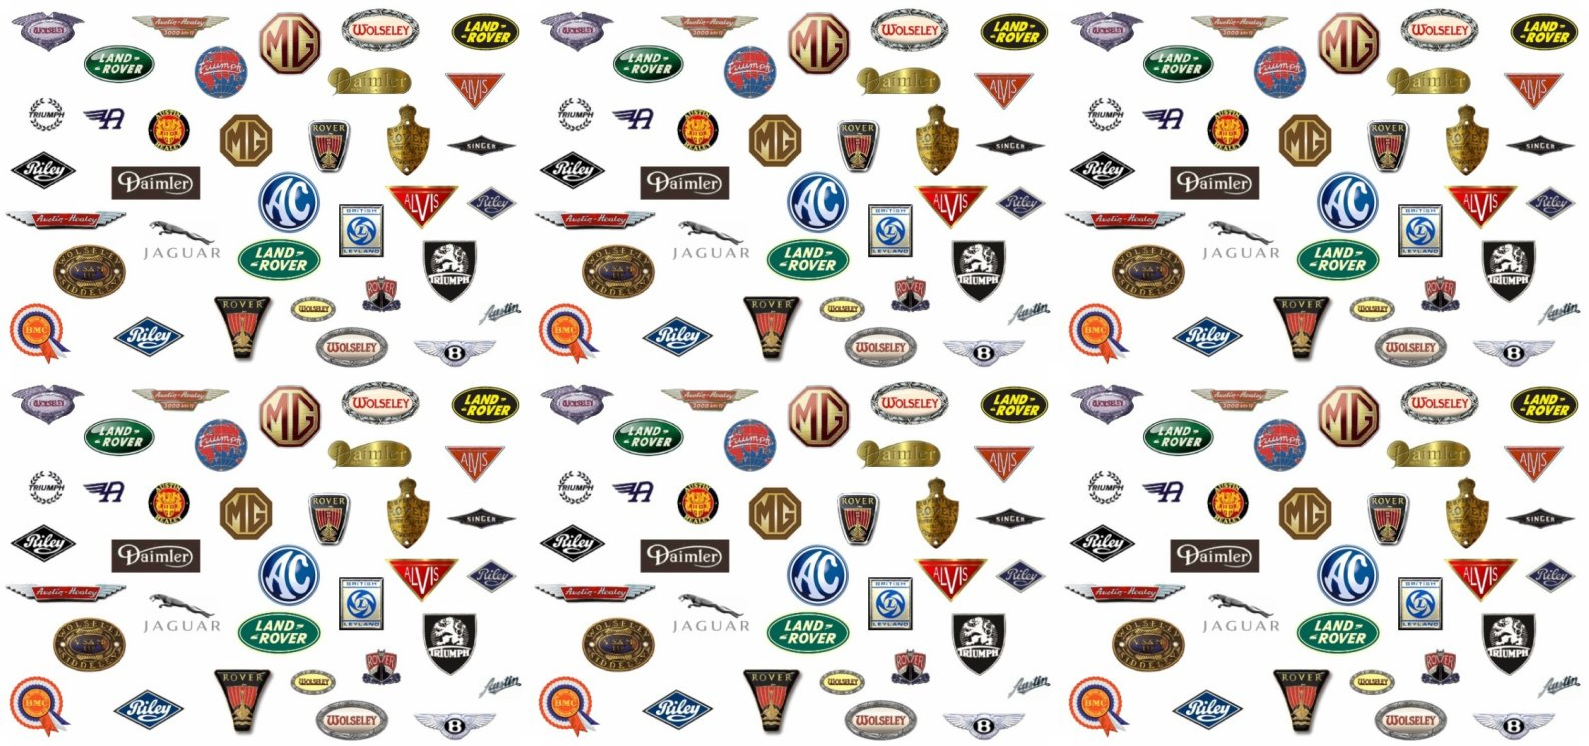 Car Symbols And Names >> Sport Car Logos And Names List Contoh Soal Dan Materi